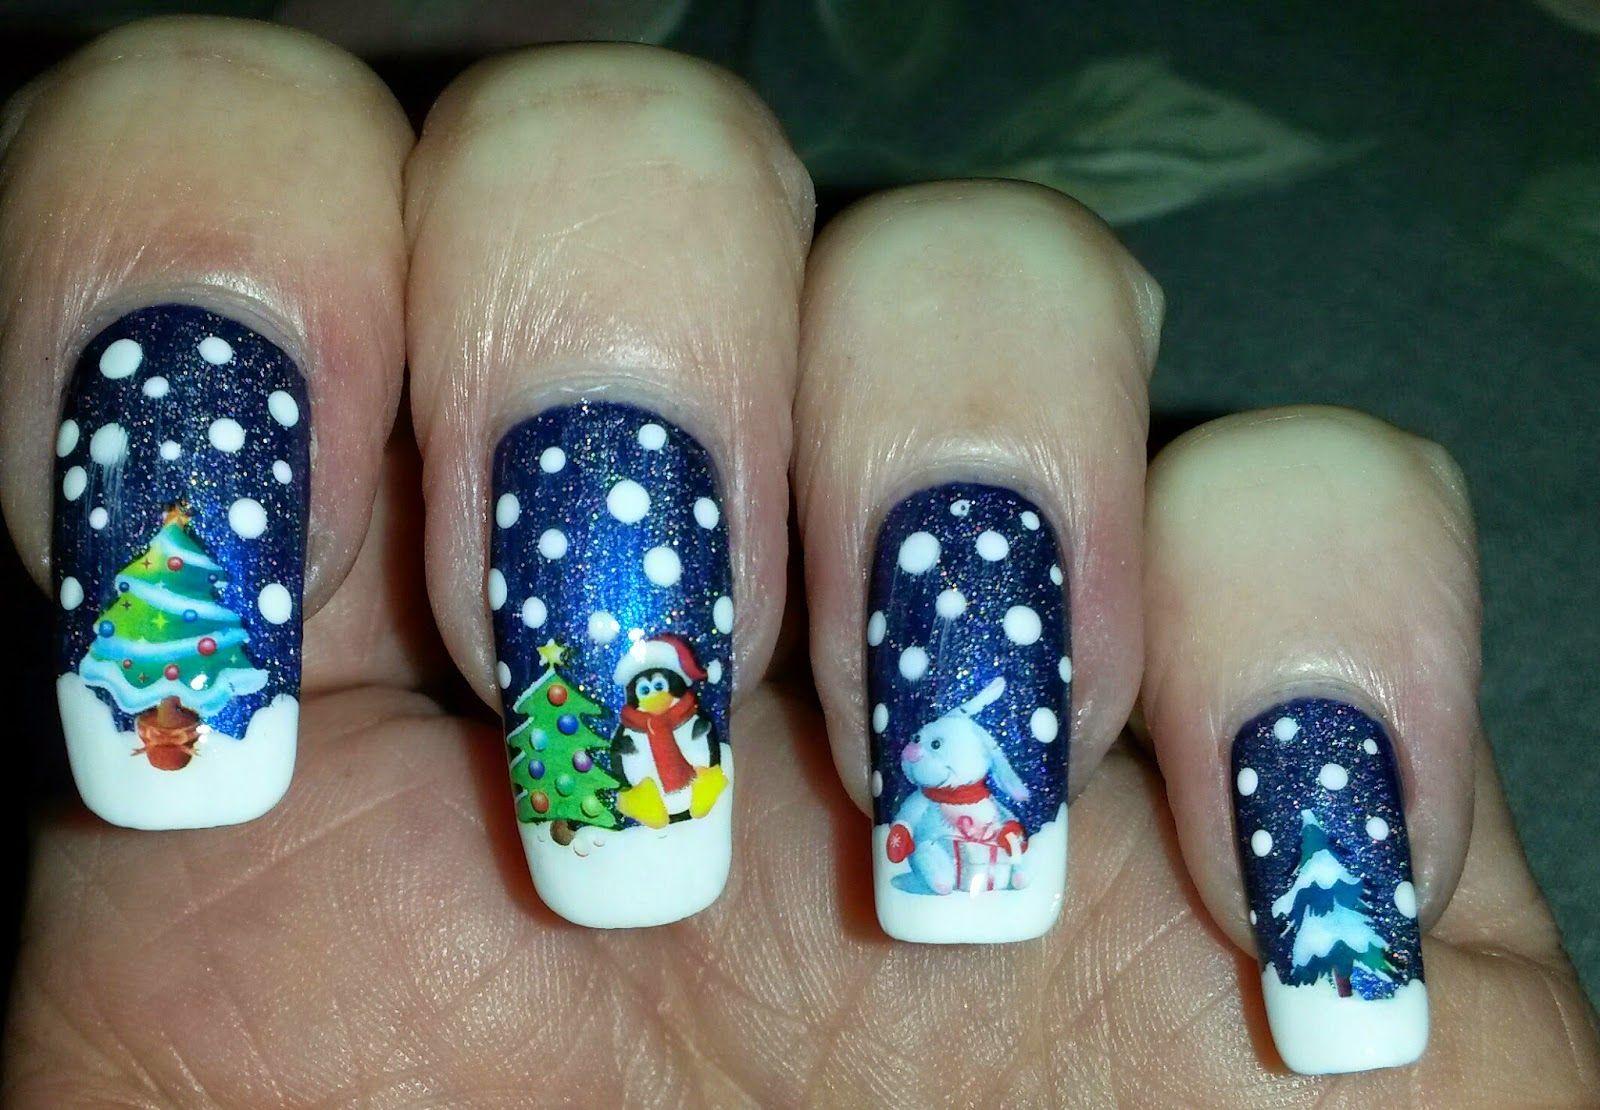 Bite No More: 12 Days of Christmas Day 2 | Nail Art - Christmas and ...